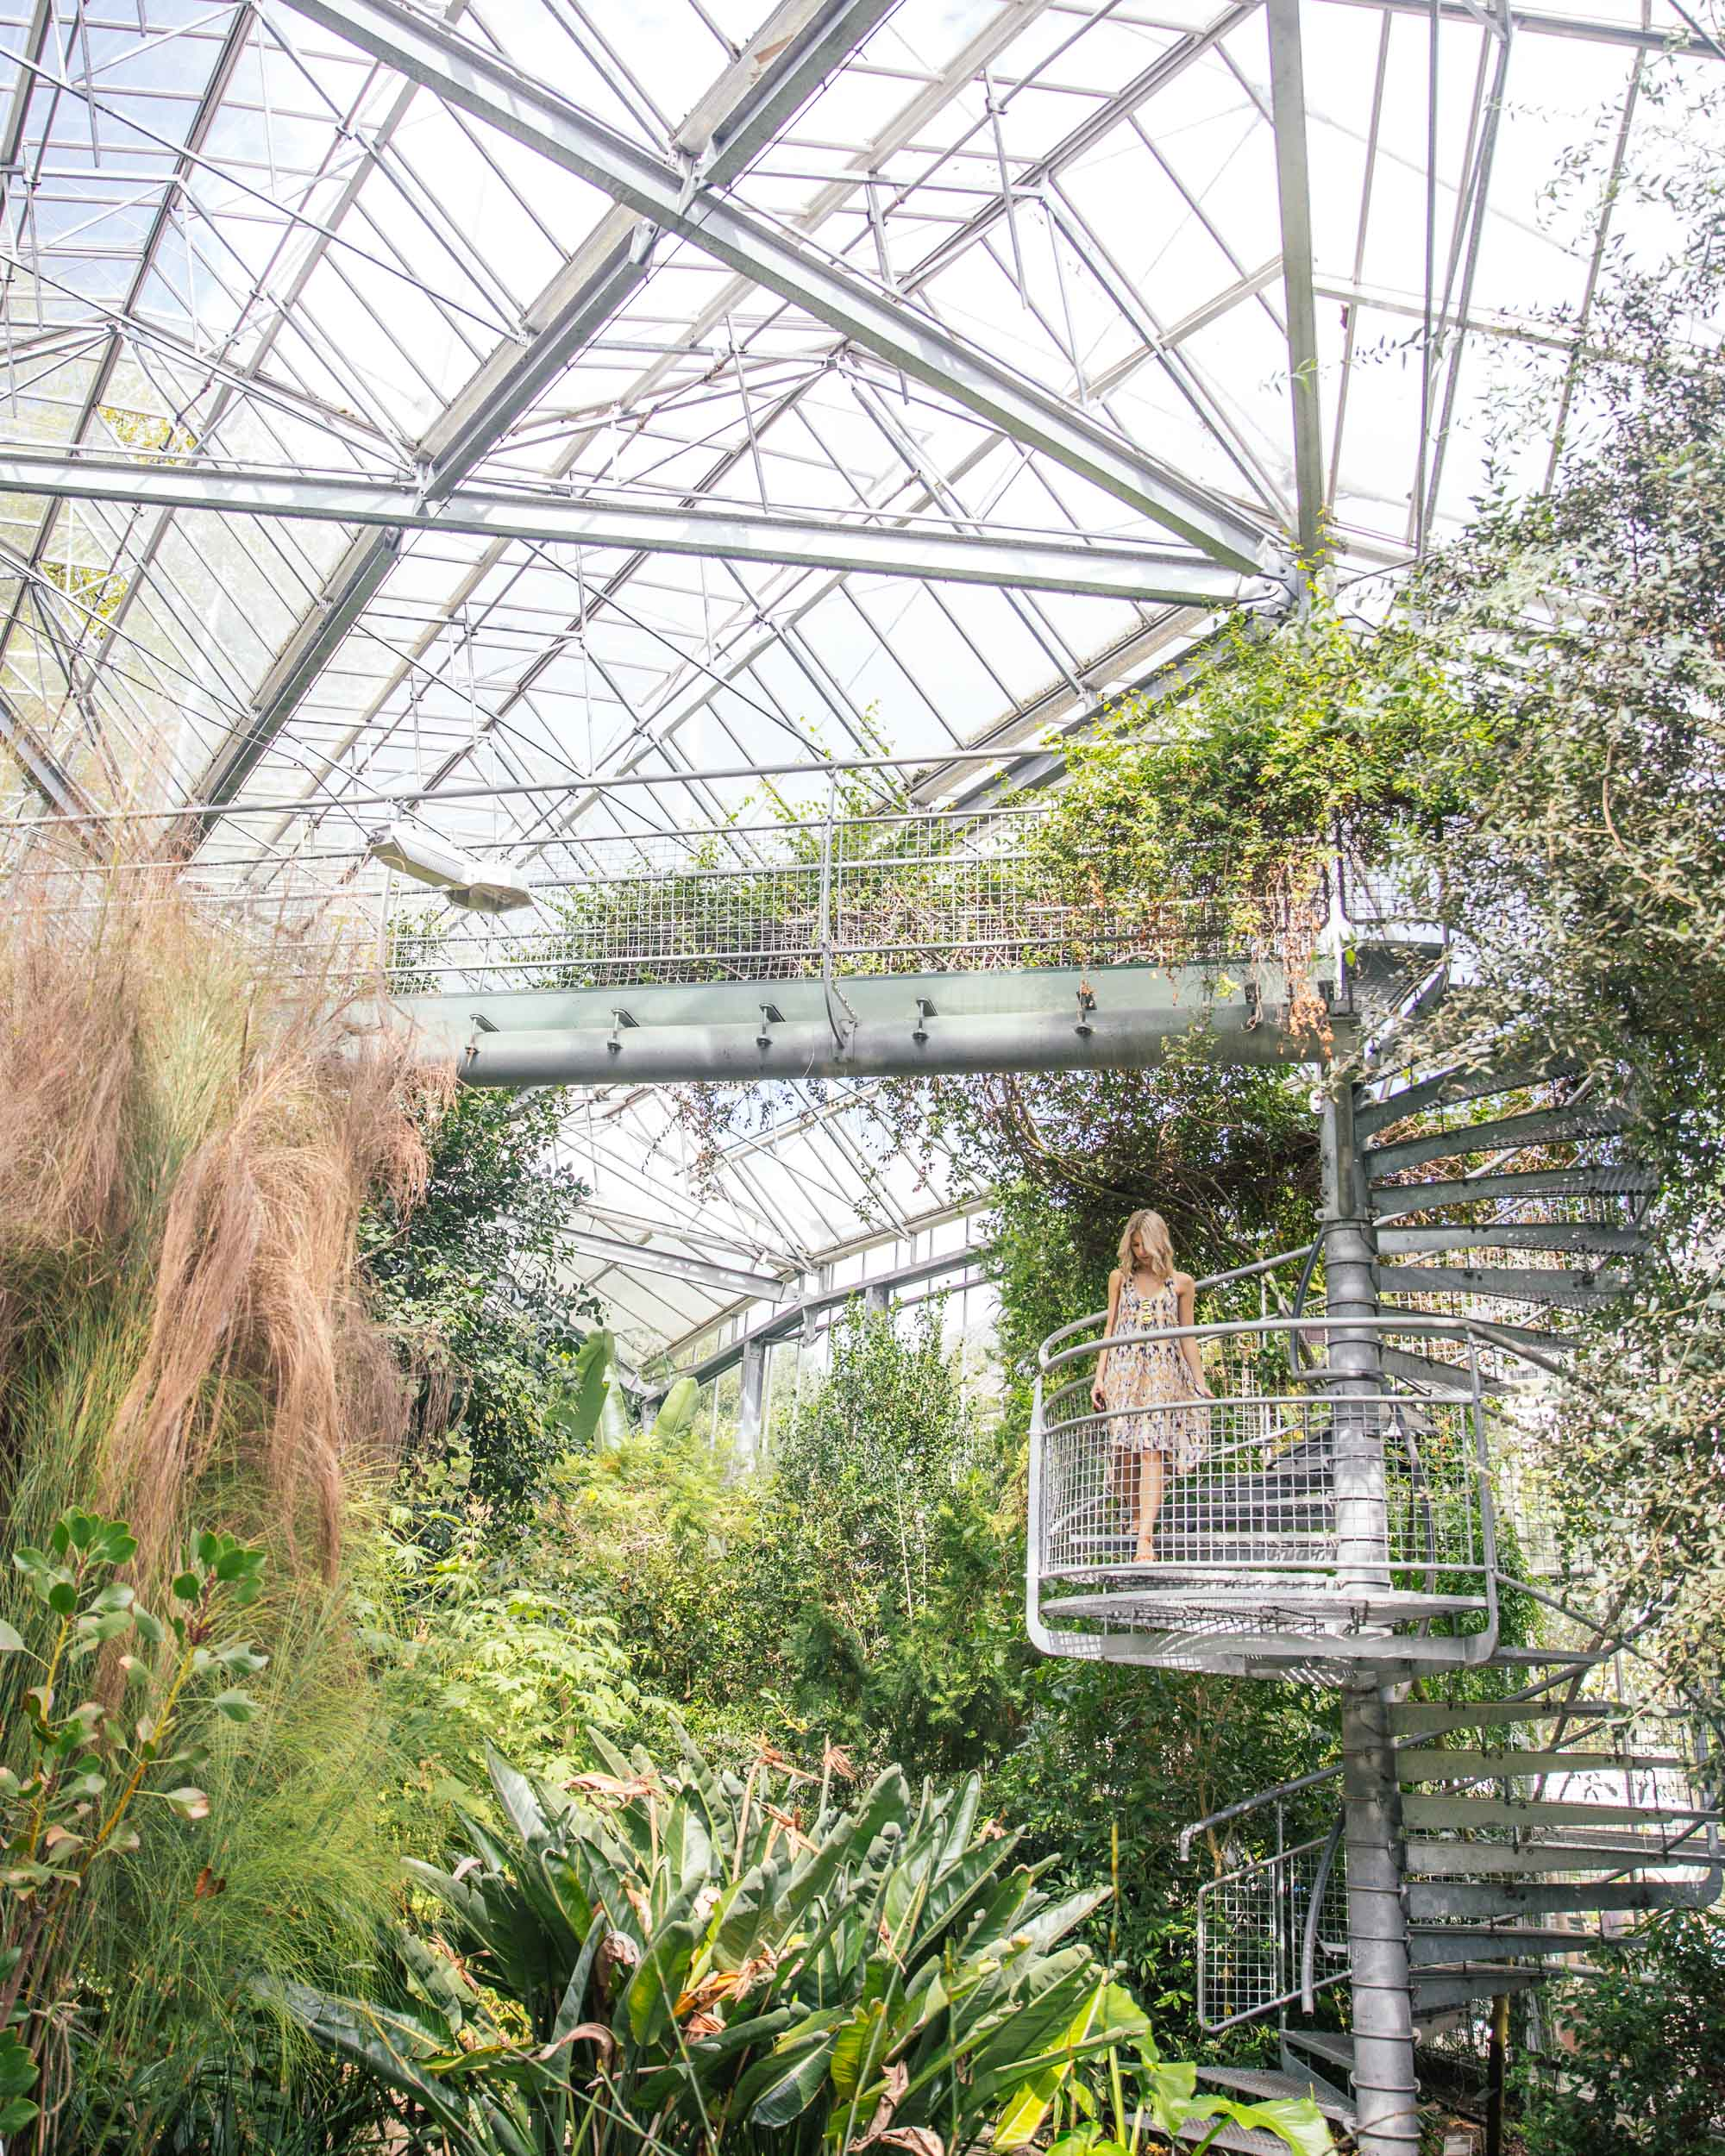 Hortus Botanicus gardens in Amsterdam city center, Holland, The Netherlands